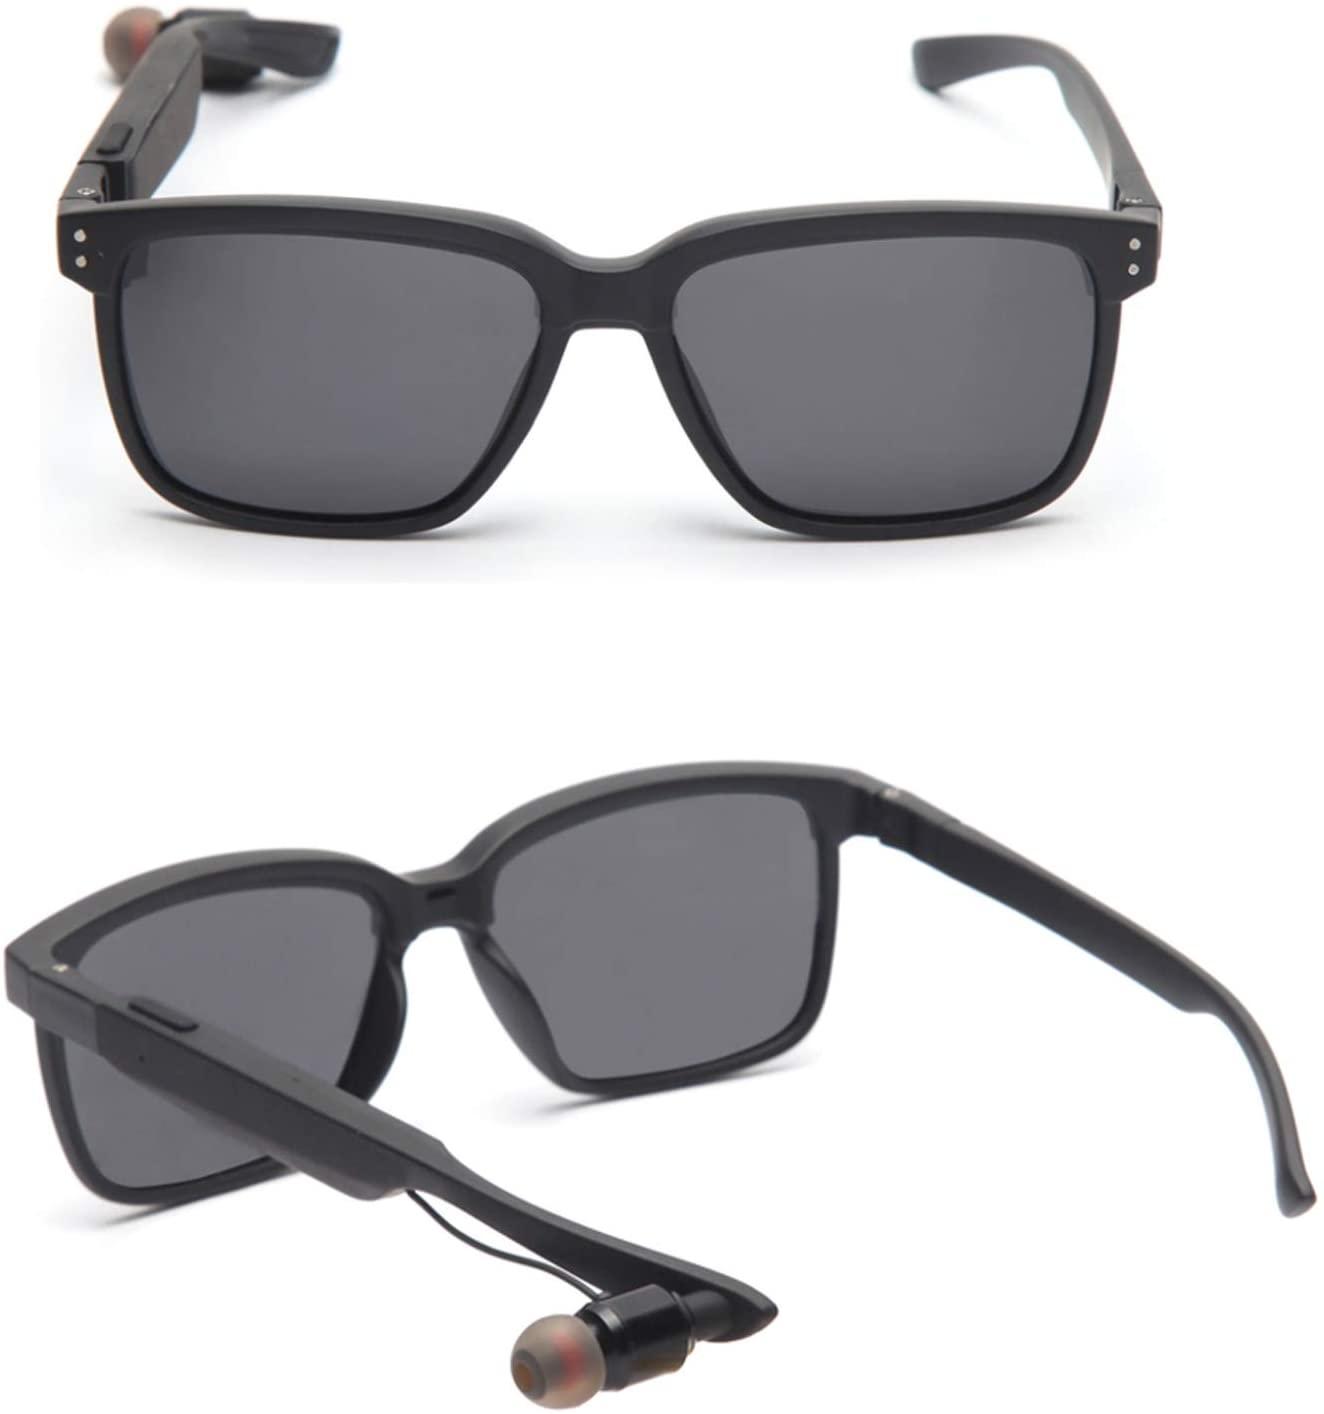 Sunglasses Wireless Headset 1